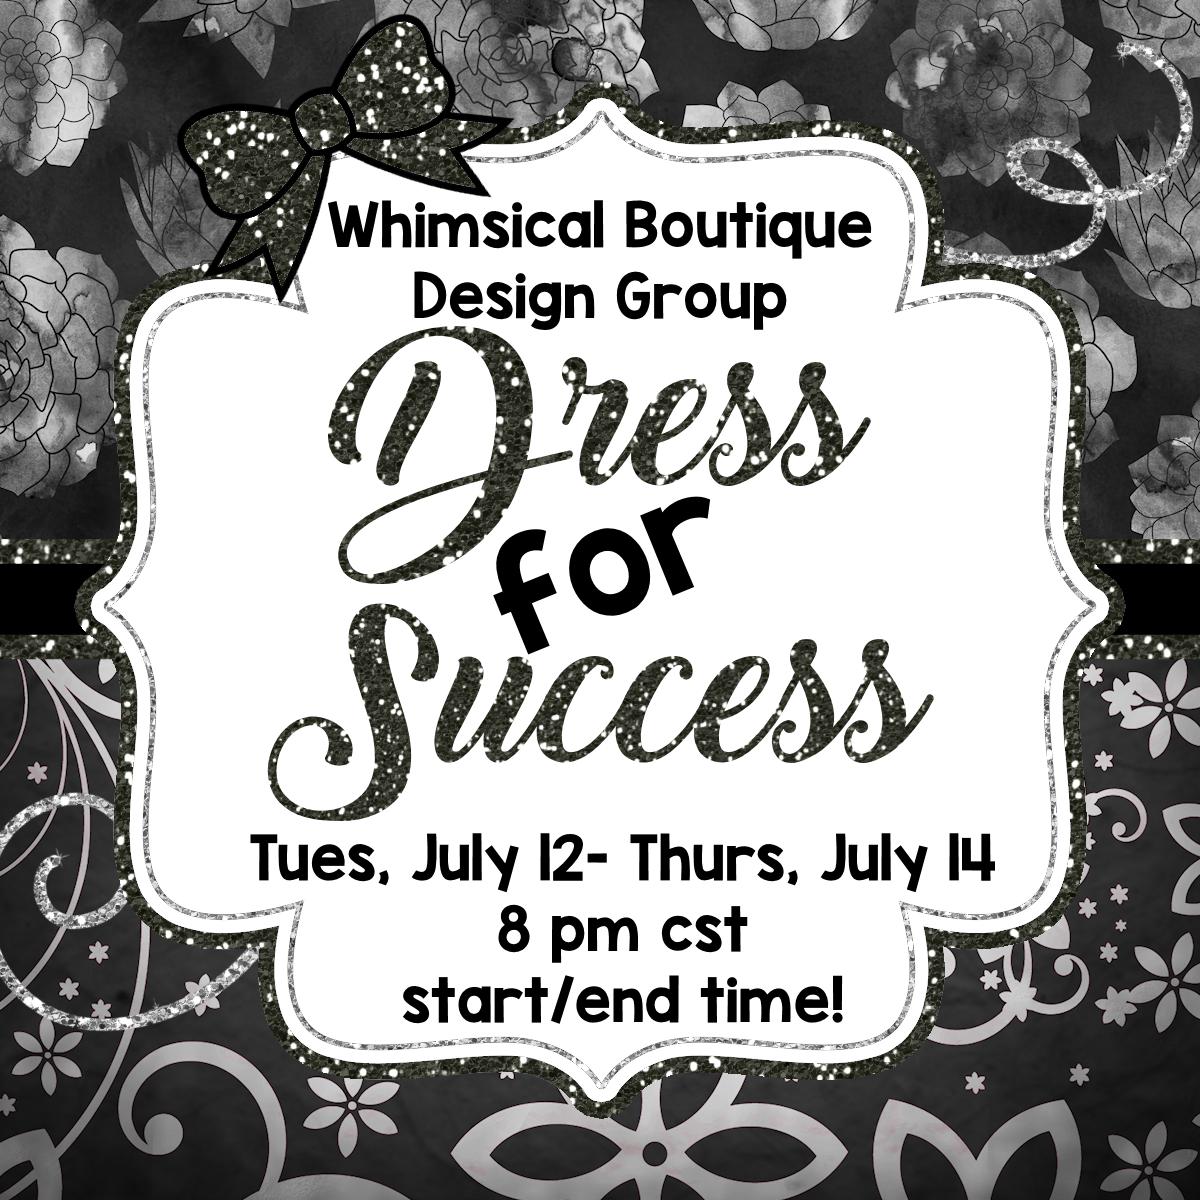 Go check out Whimsical Boutique Design Groupus Dress for Success